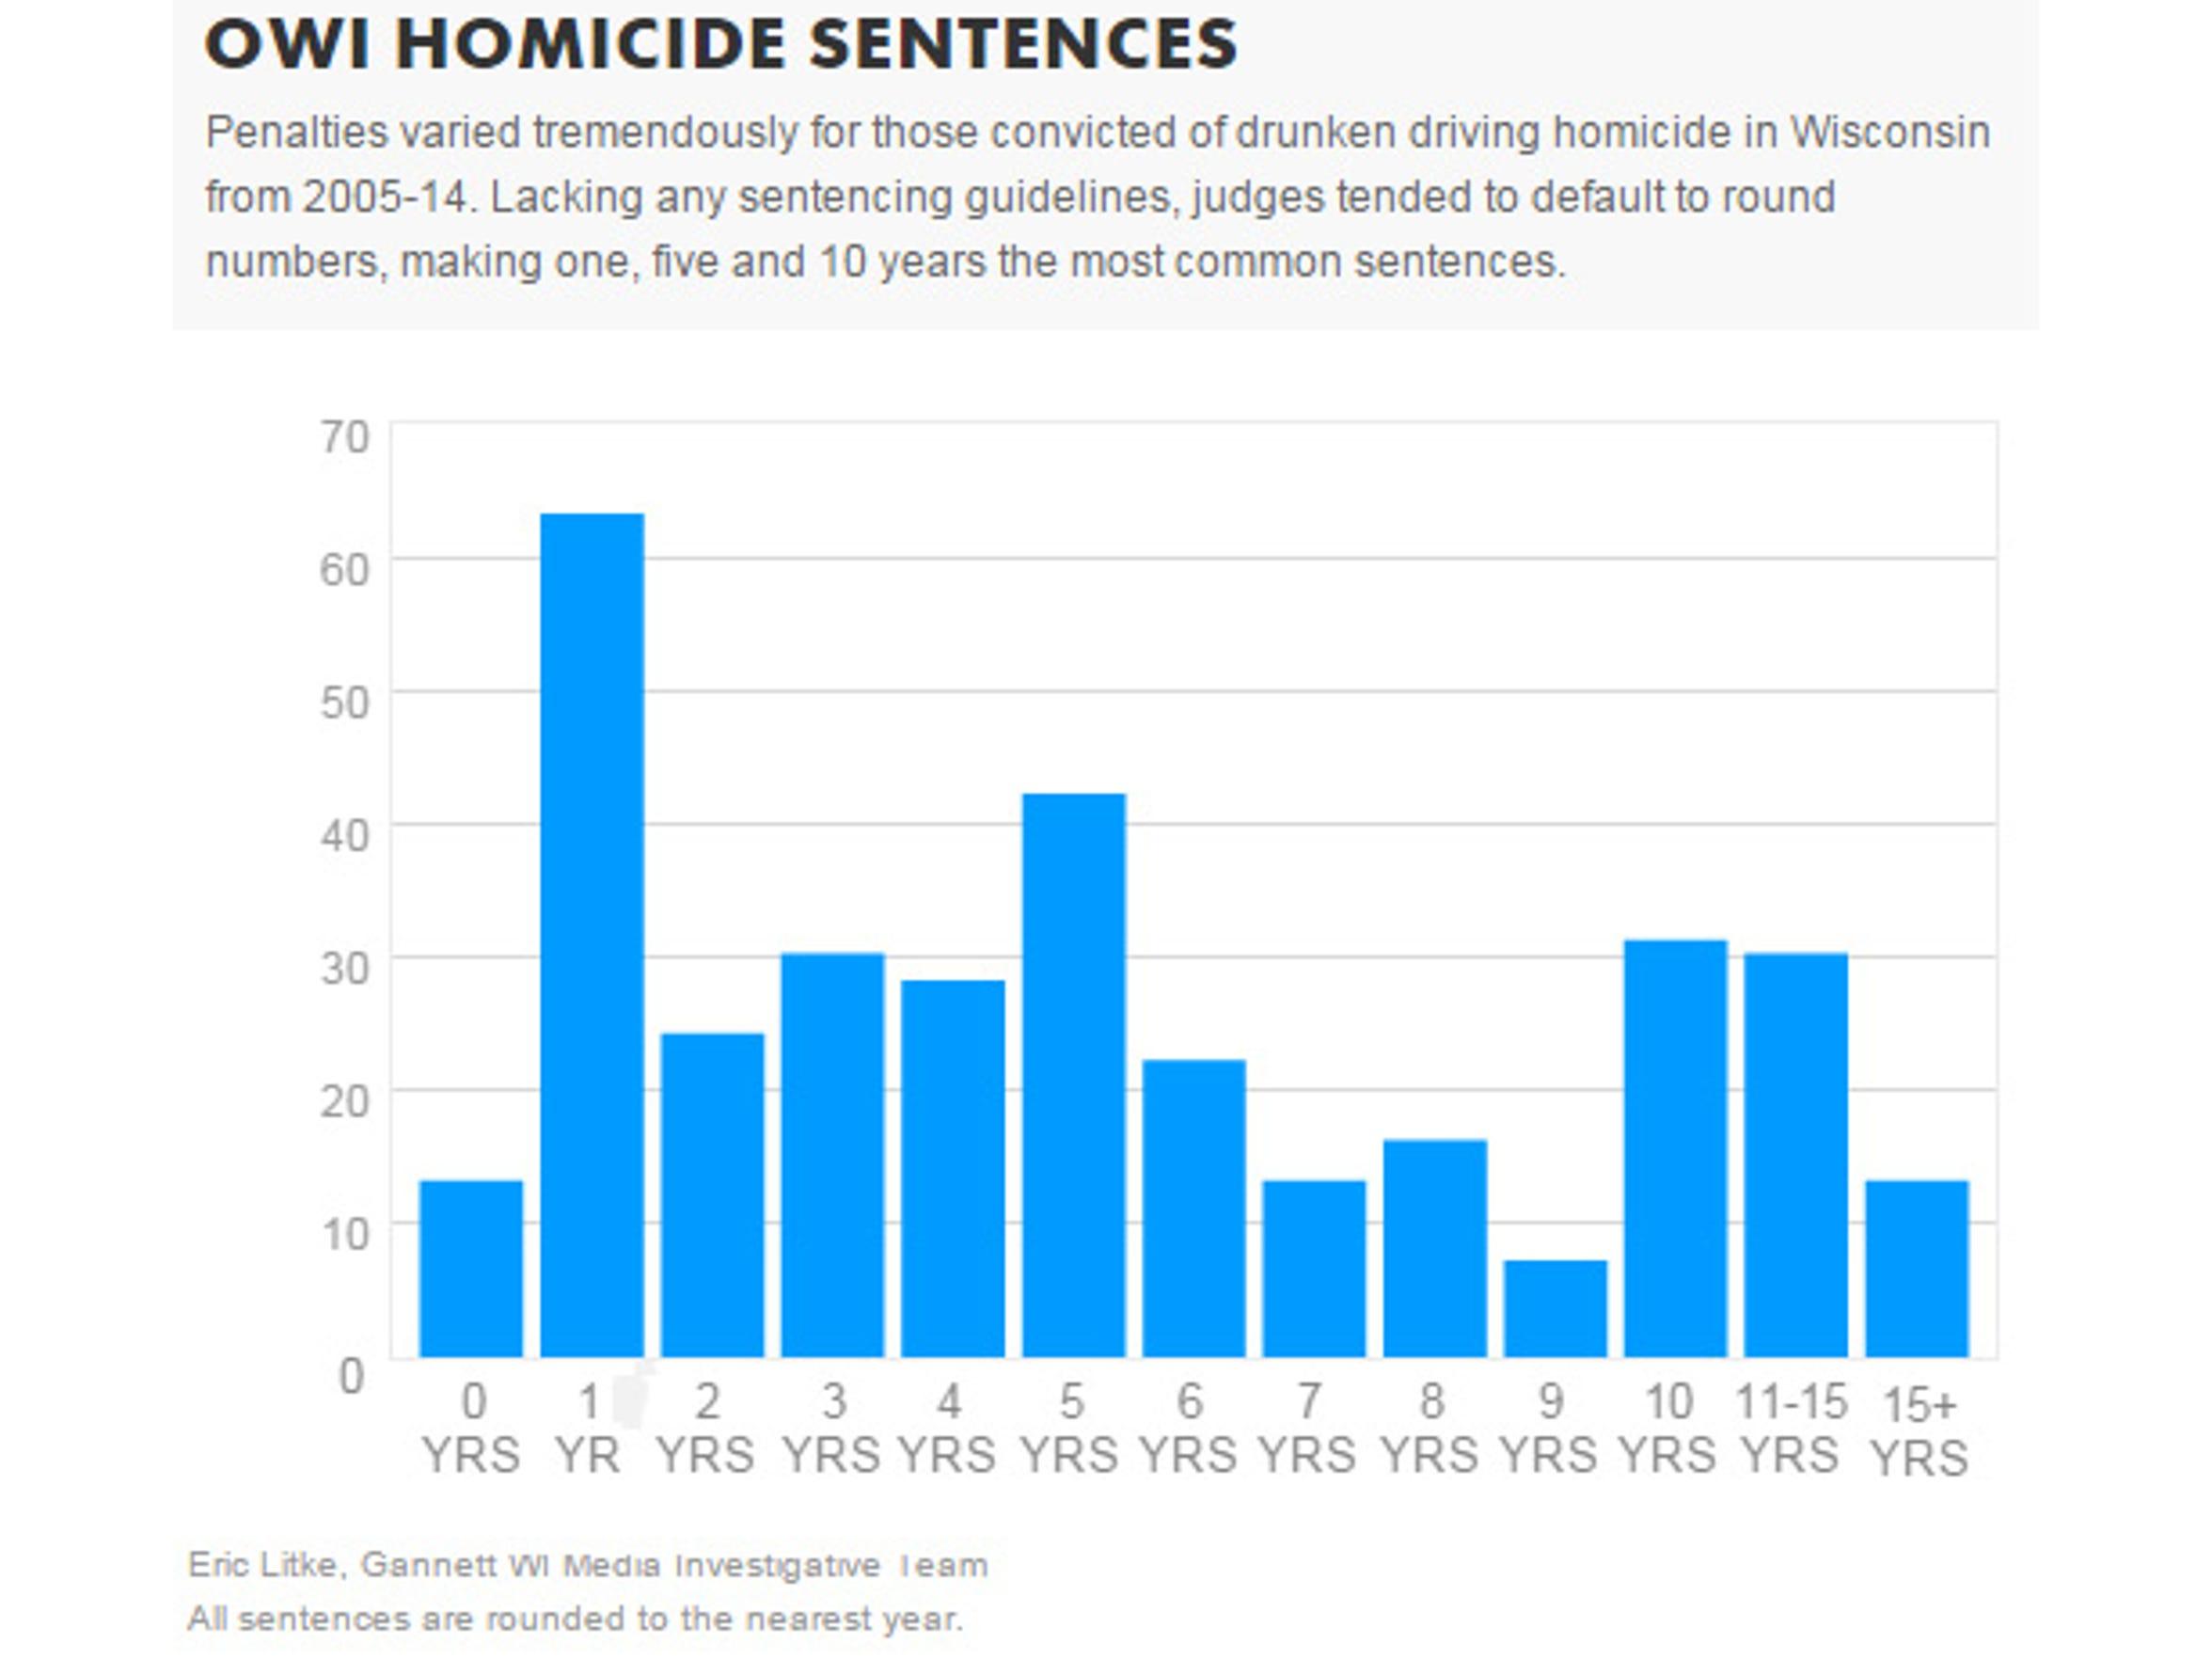 OWI homicide sentencing